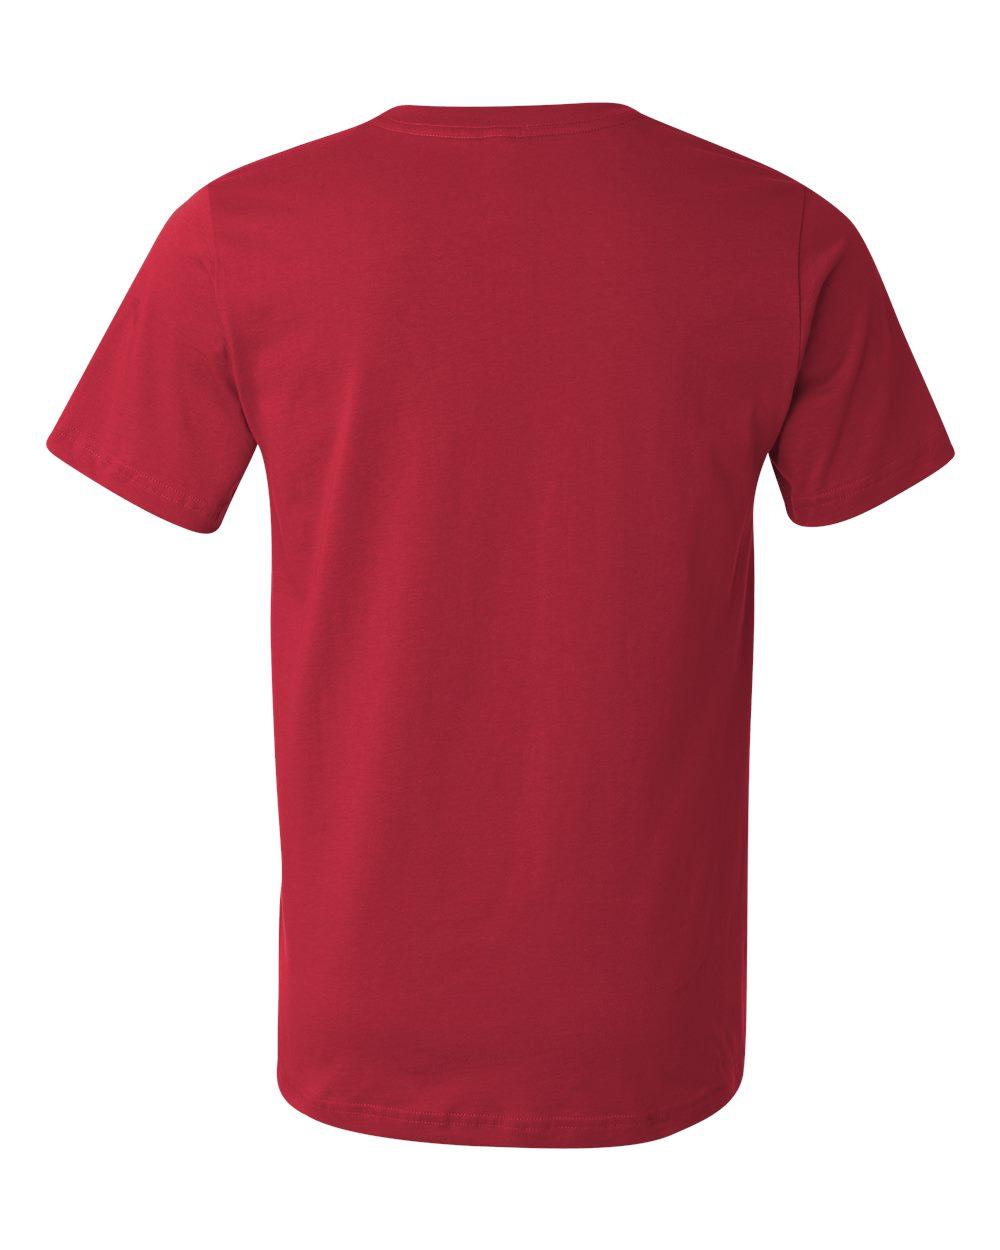 Bella-Canvas-Unisex-Made-in-USA-Jersey-Short-Sleeve-T-Shirt-3001U-XS-3XL thumbnail 37